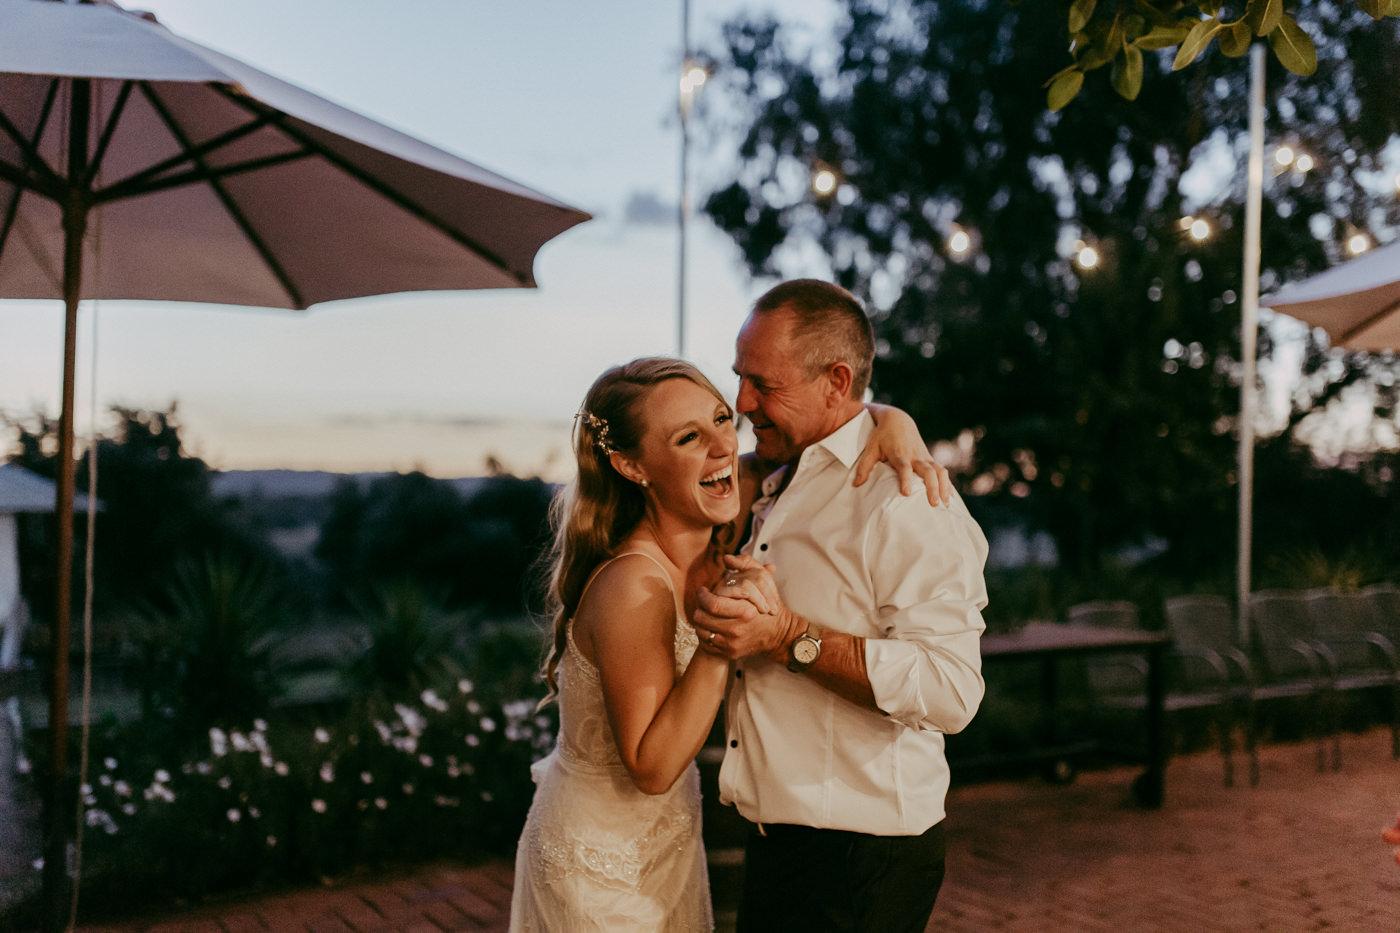 Anthony & Eliet - Wagga Wagga Wedding - Country NSW - Samantha Heather Photography-173.jpg